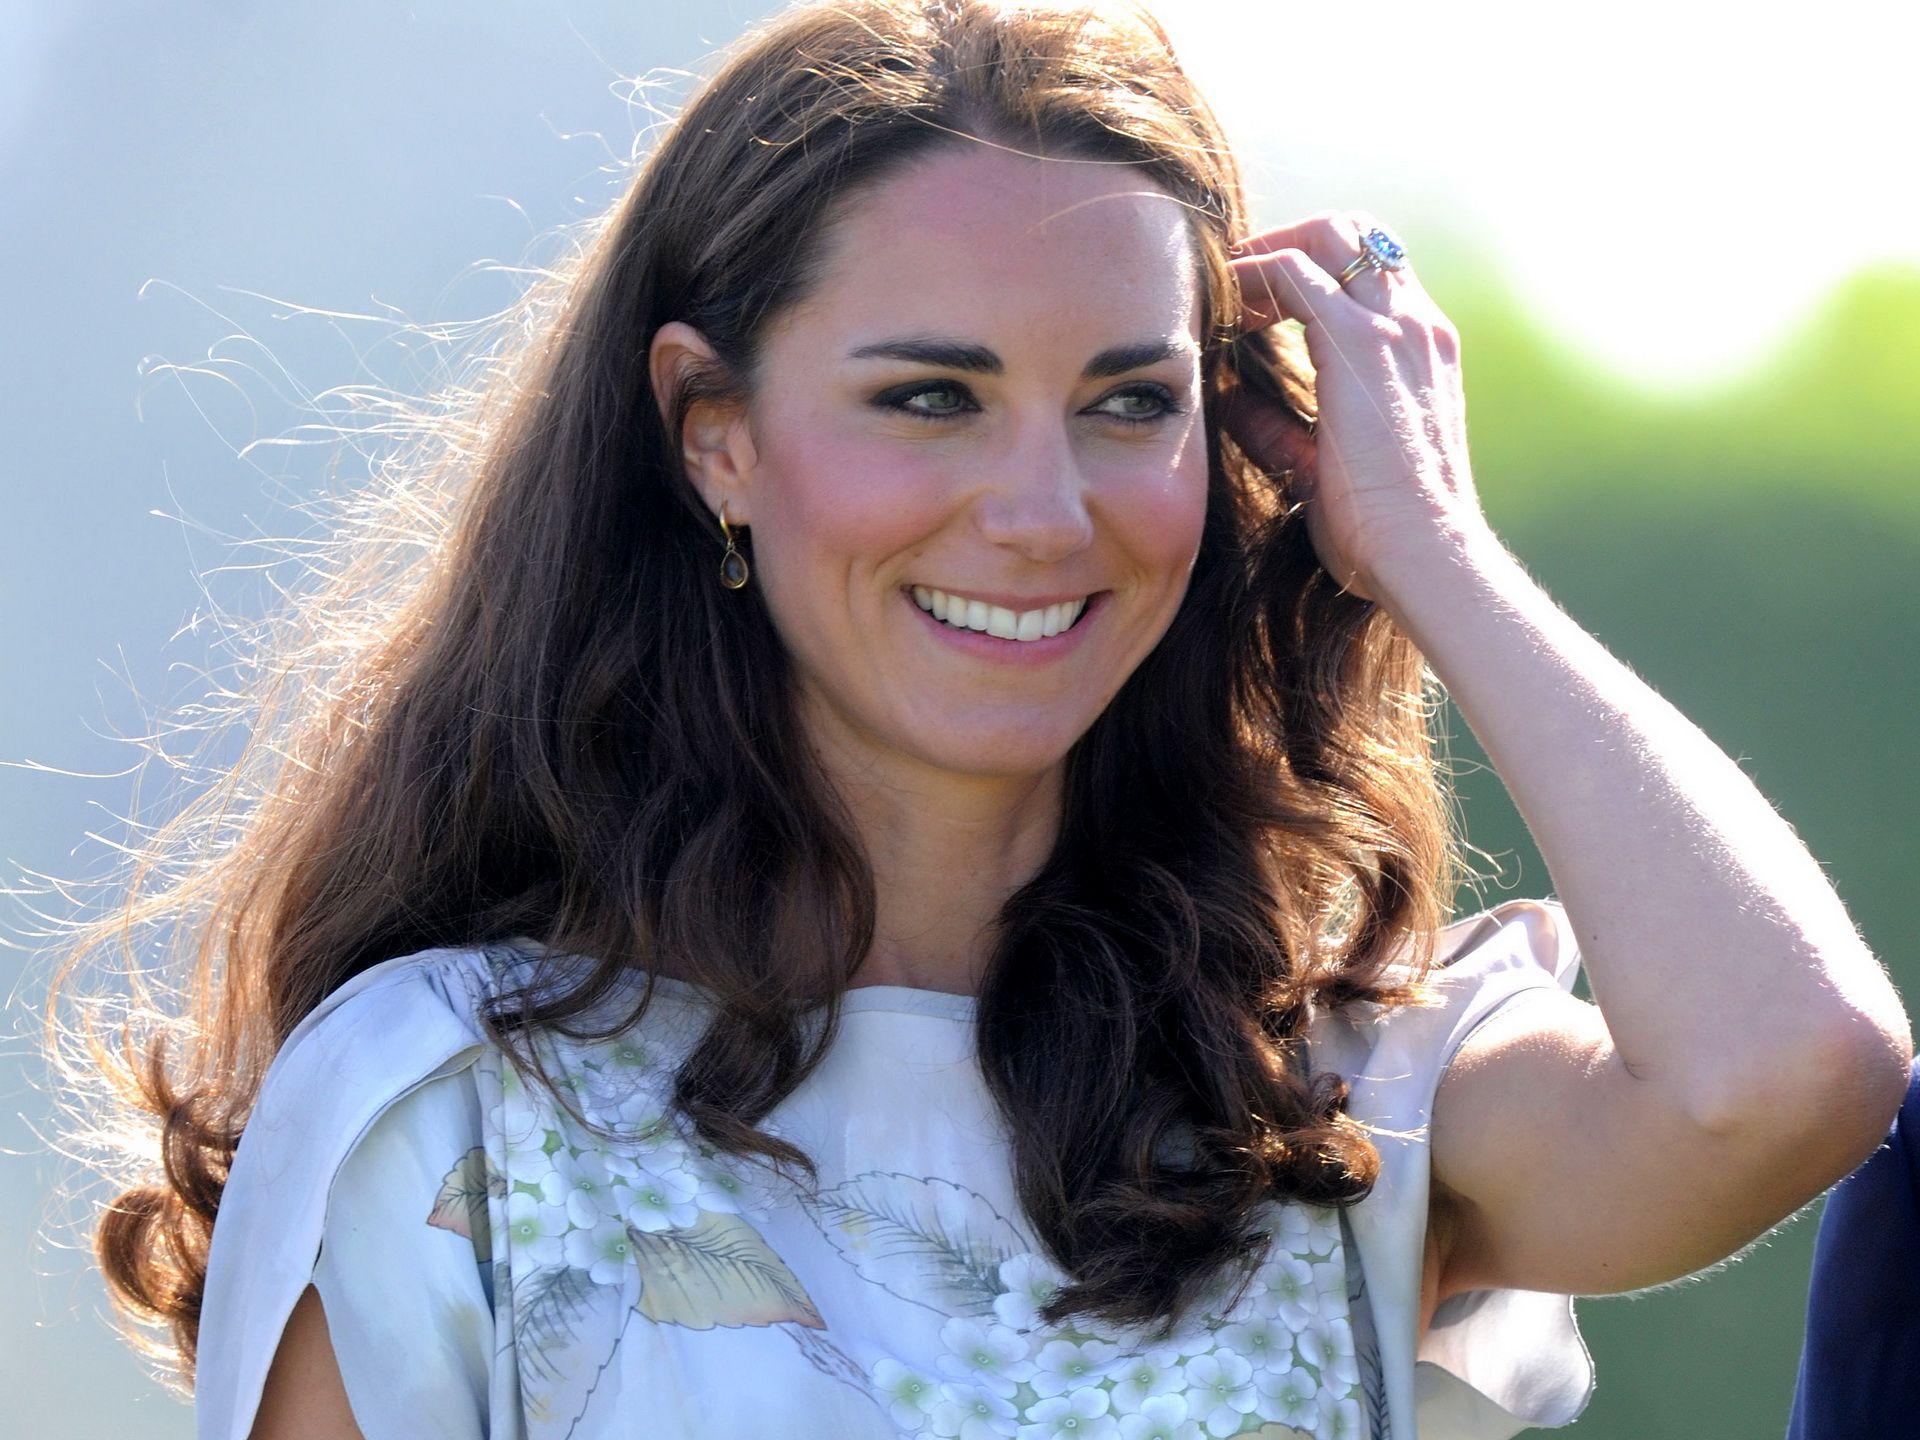 kate middleton | Kate Middleton cute smile | famous-wallpapers